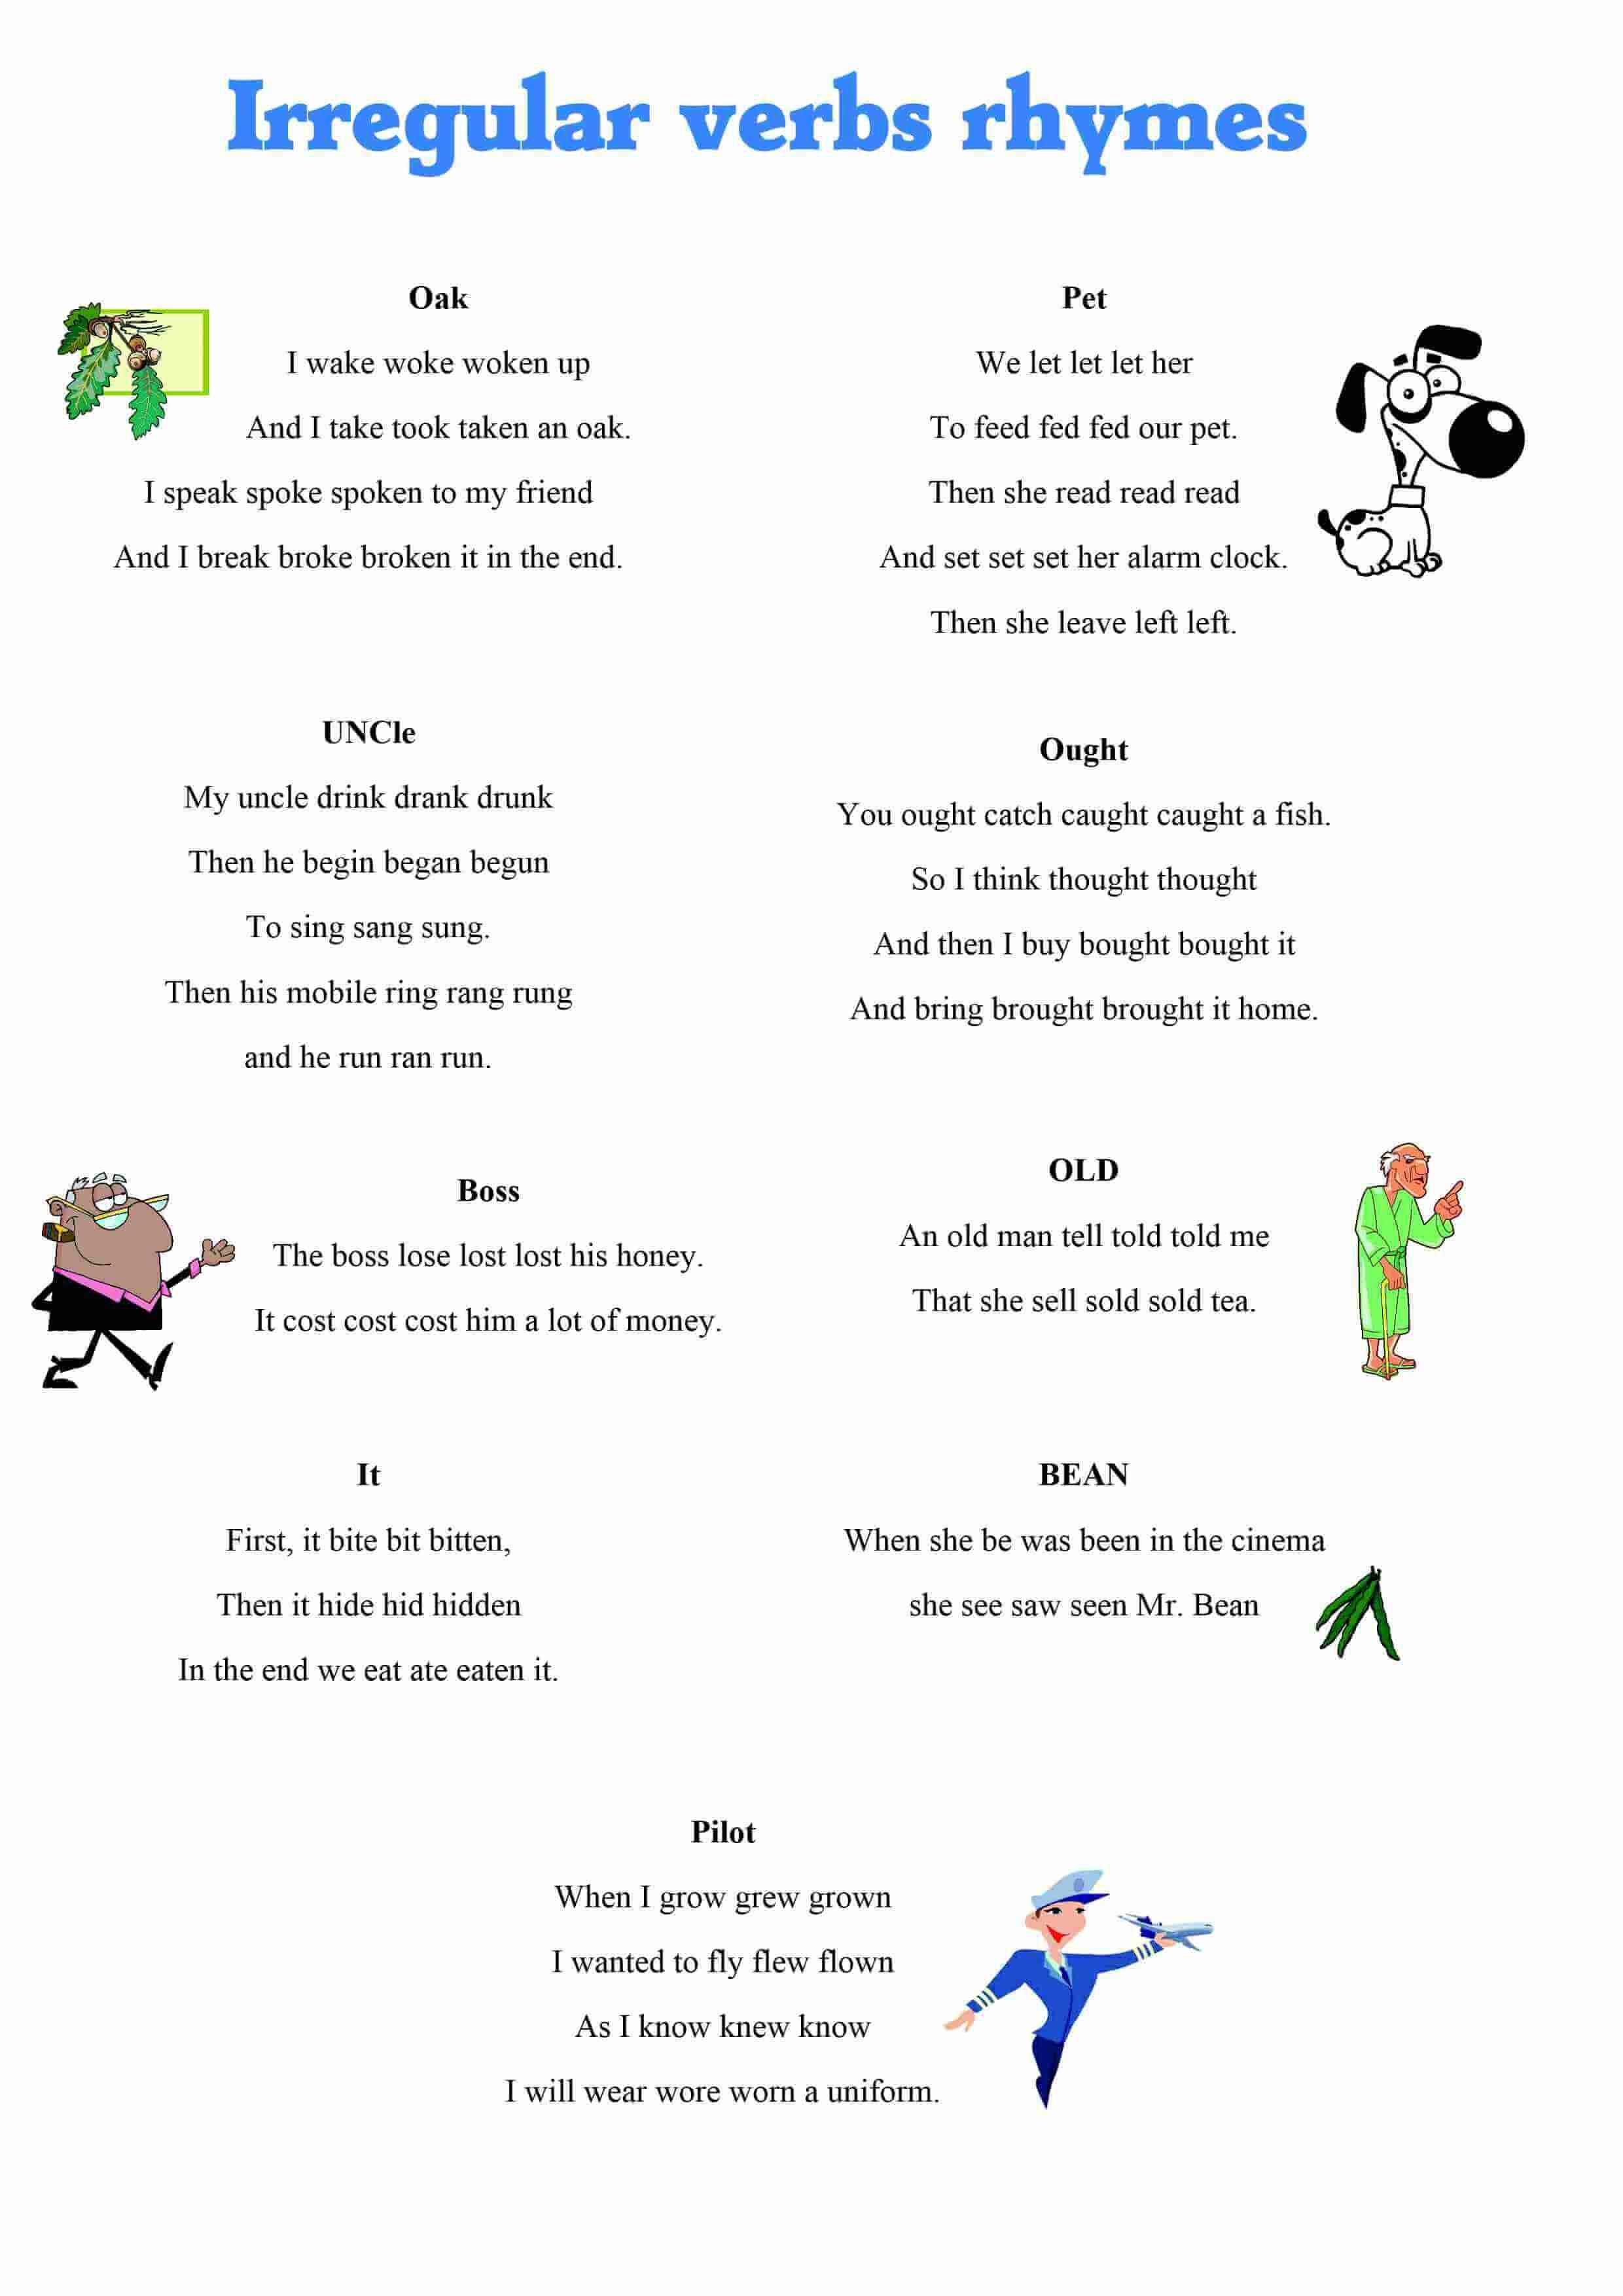 Irregular Verbs Rhymes Irregular Verbs Verb Worksheets Learn English [ 3508 x 2480 Pixel ]